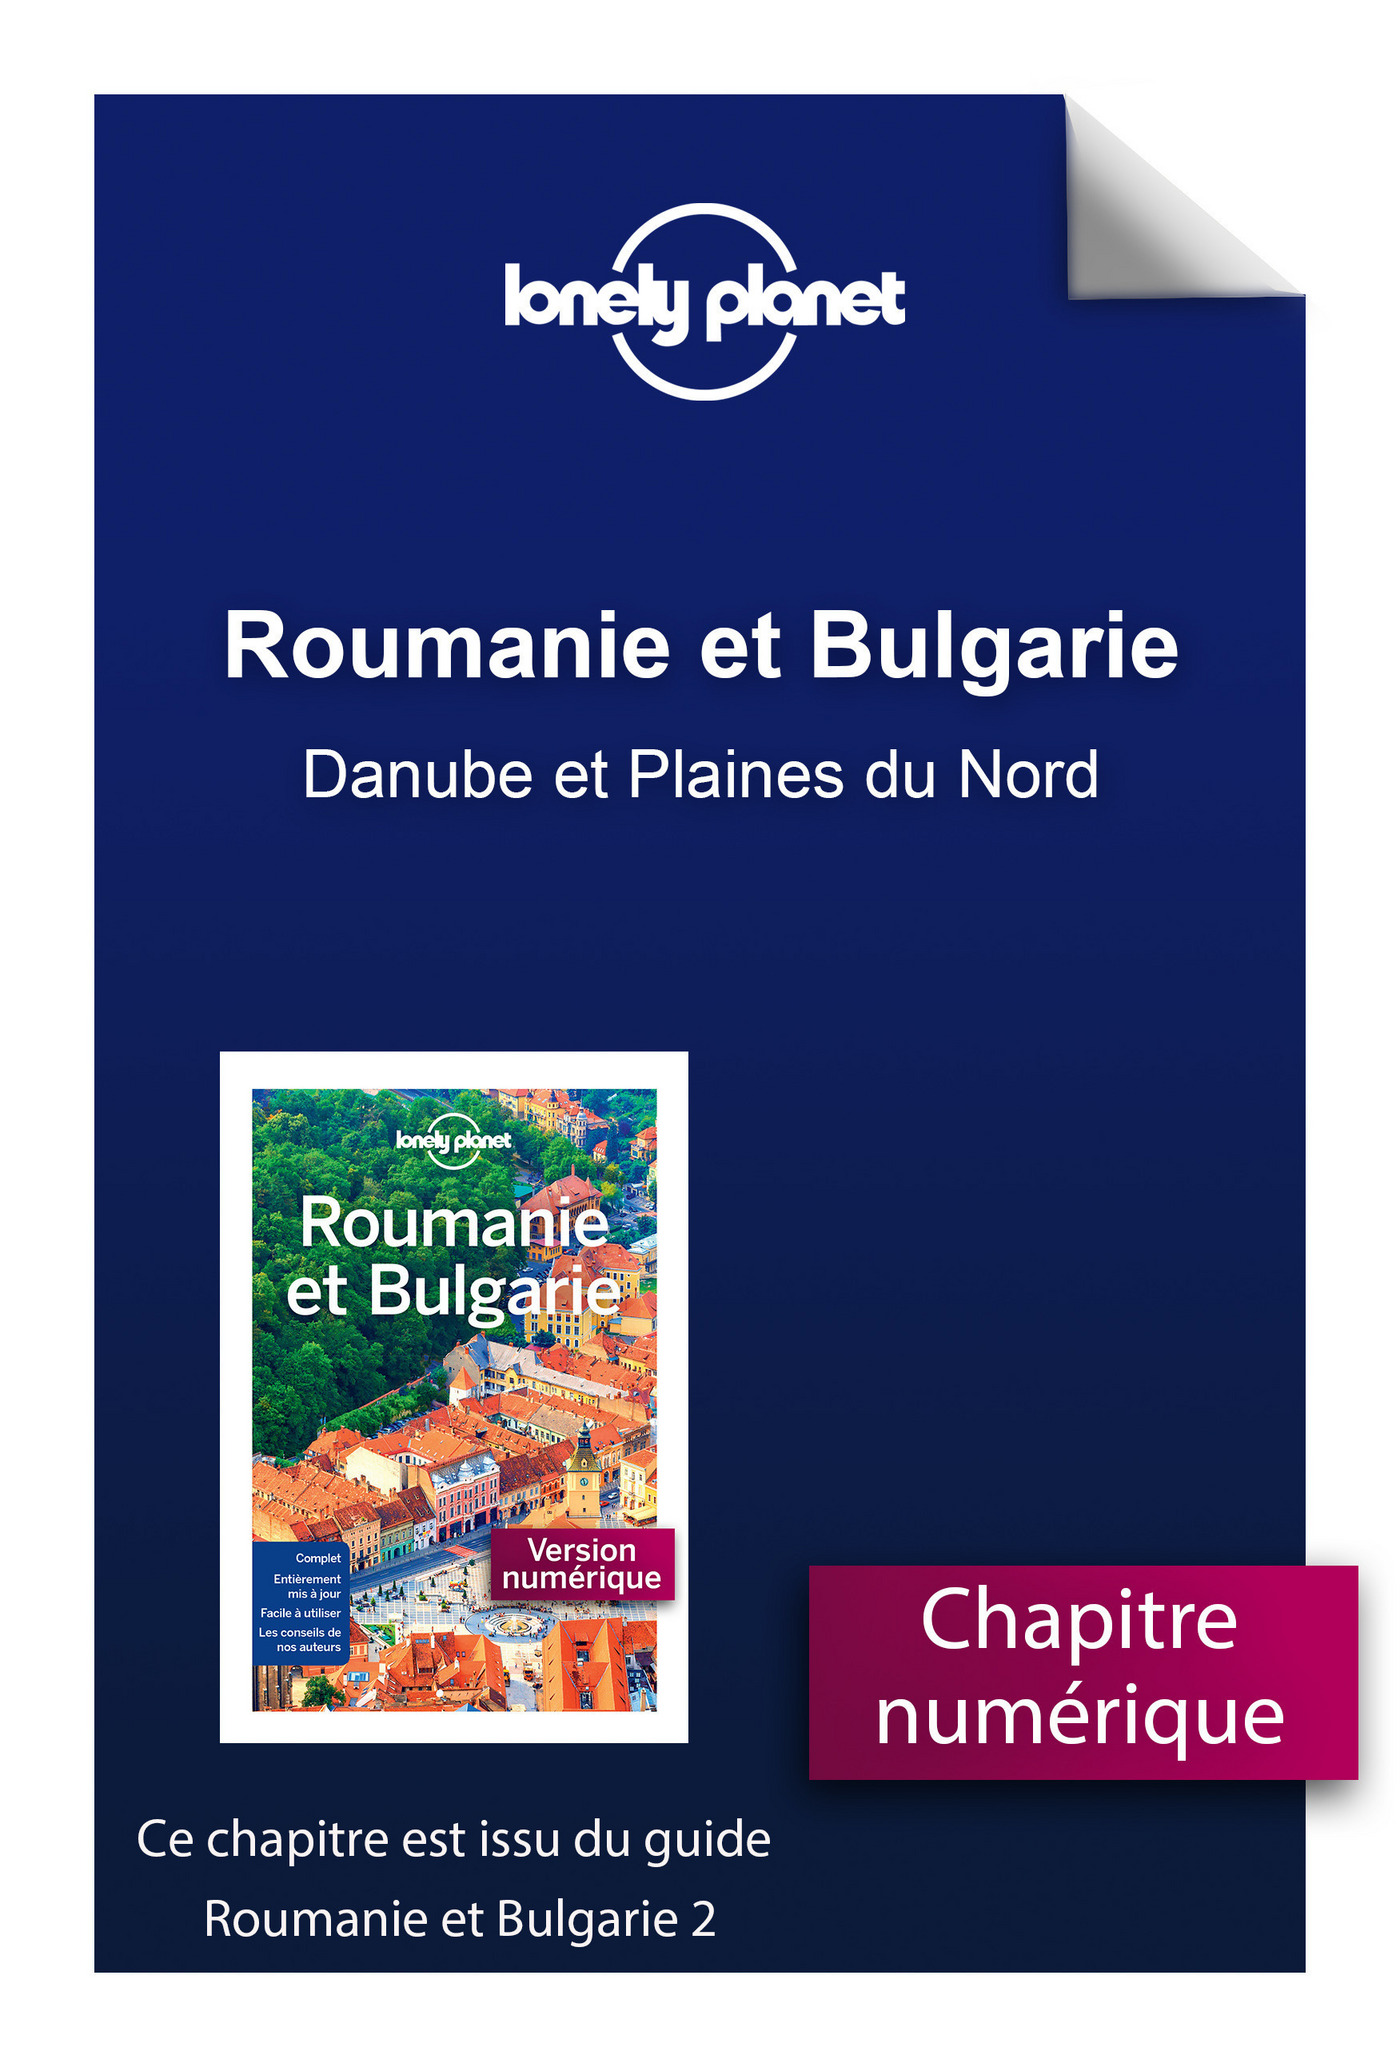 Roumanie et Bulgarie - Danube et Plaines du Nord